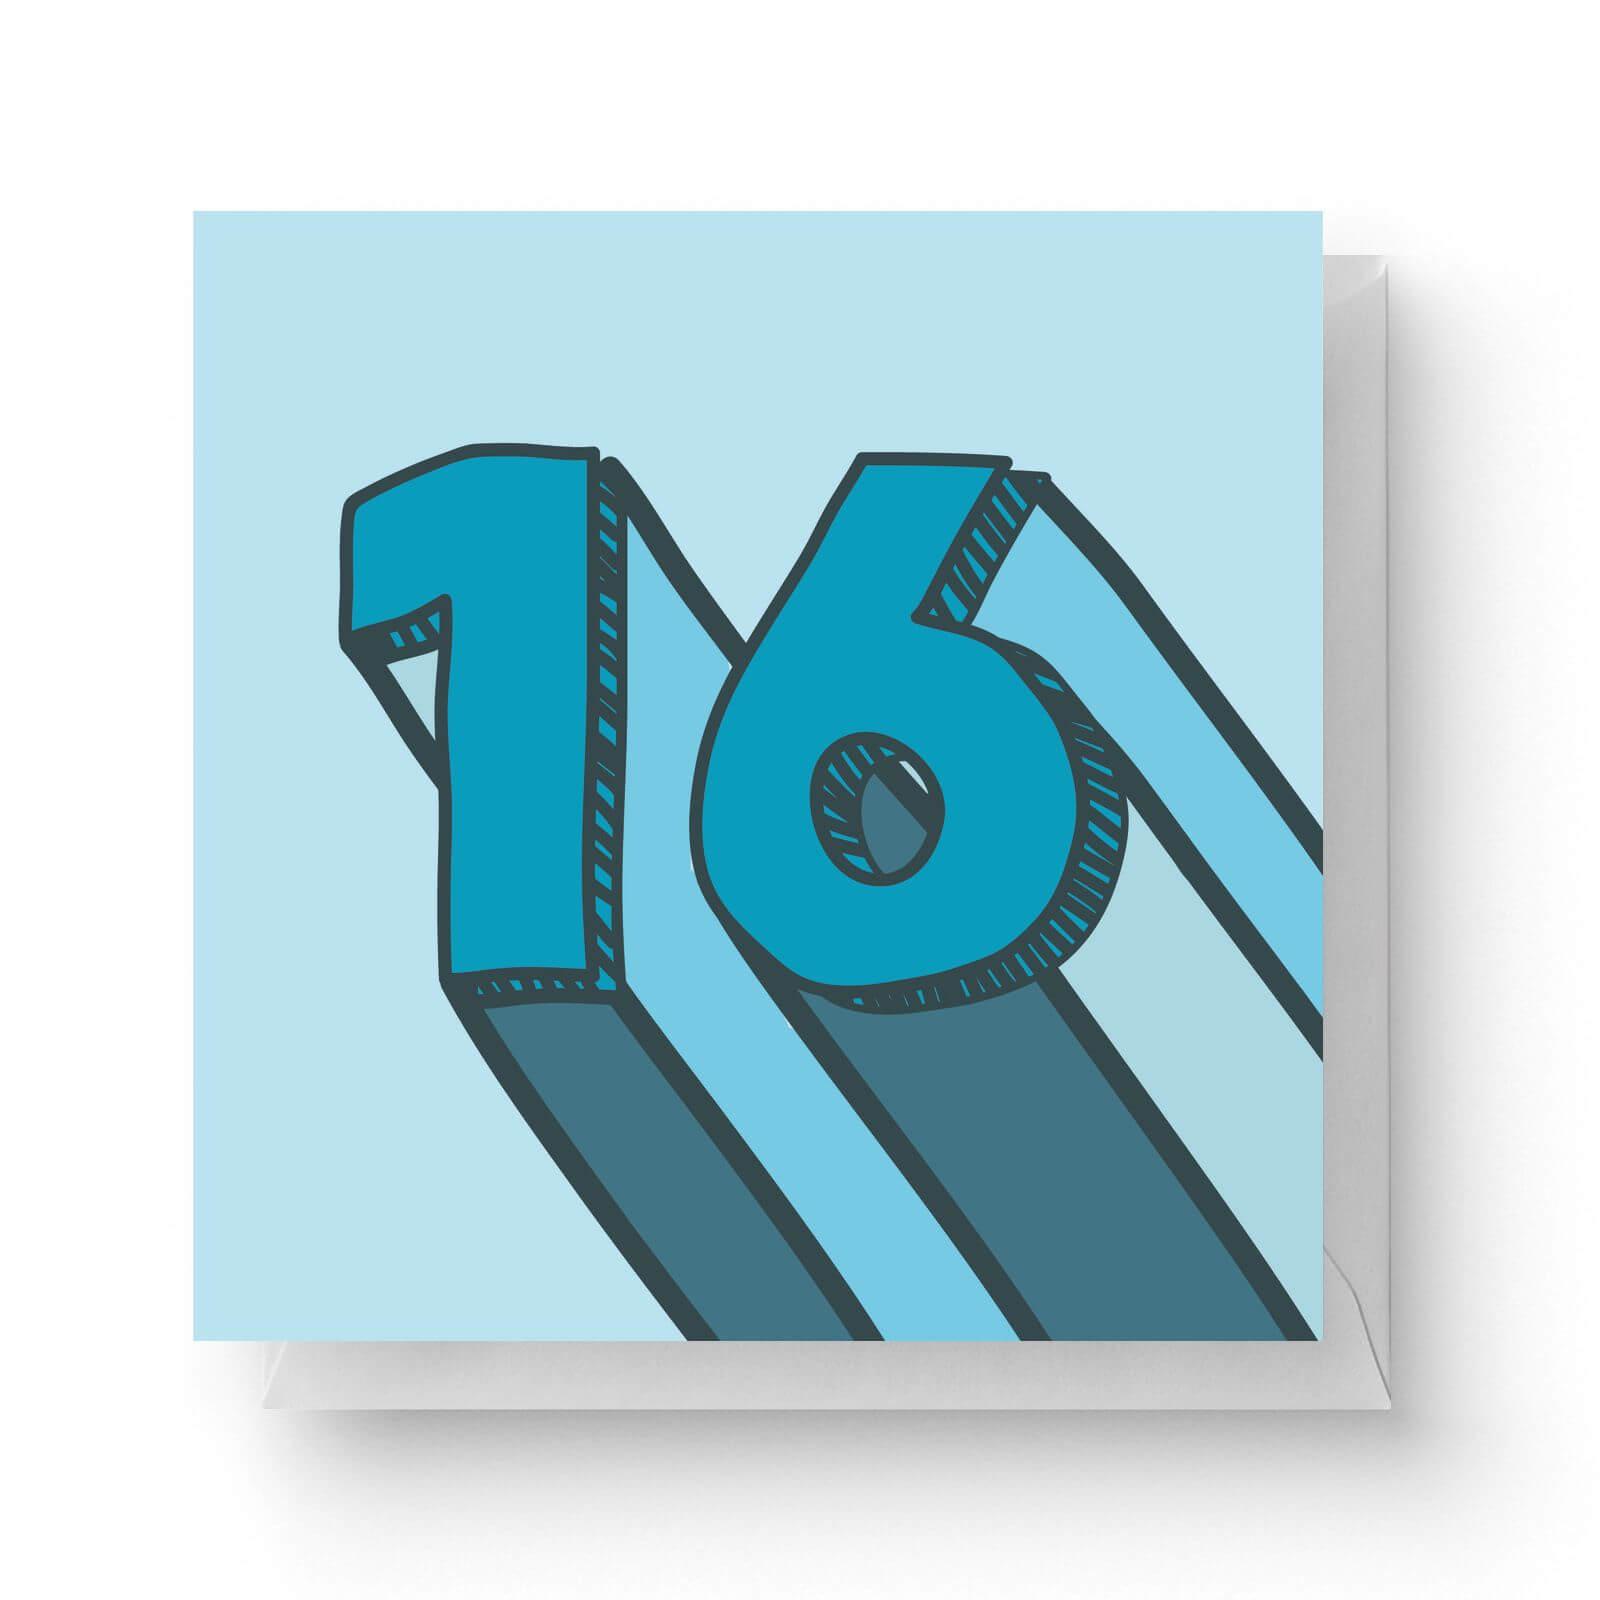 Image of 16 Square Greetings Card (14.8cm x 14.8cm)